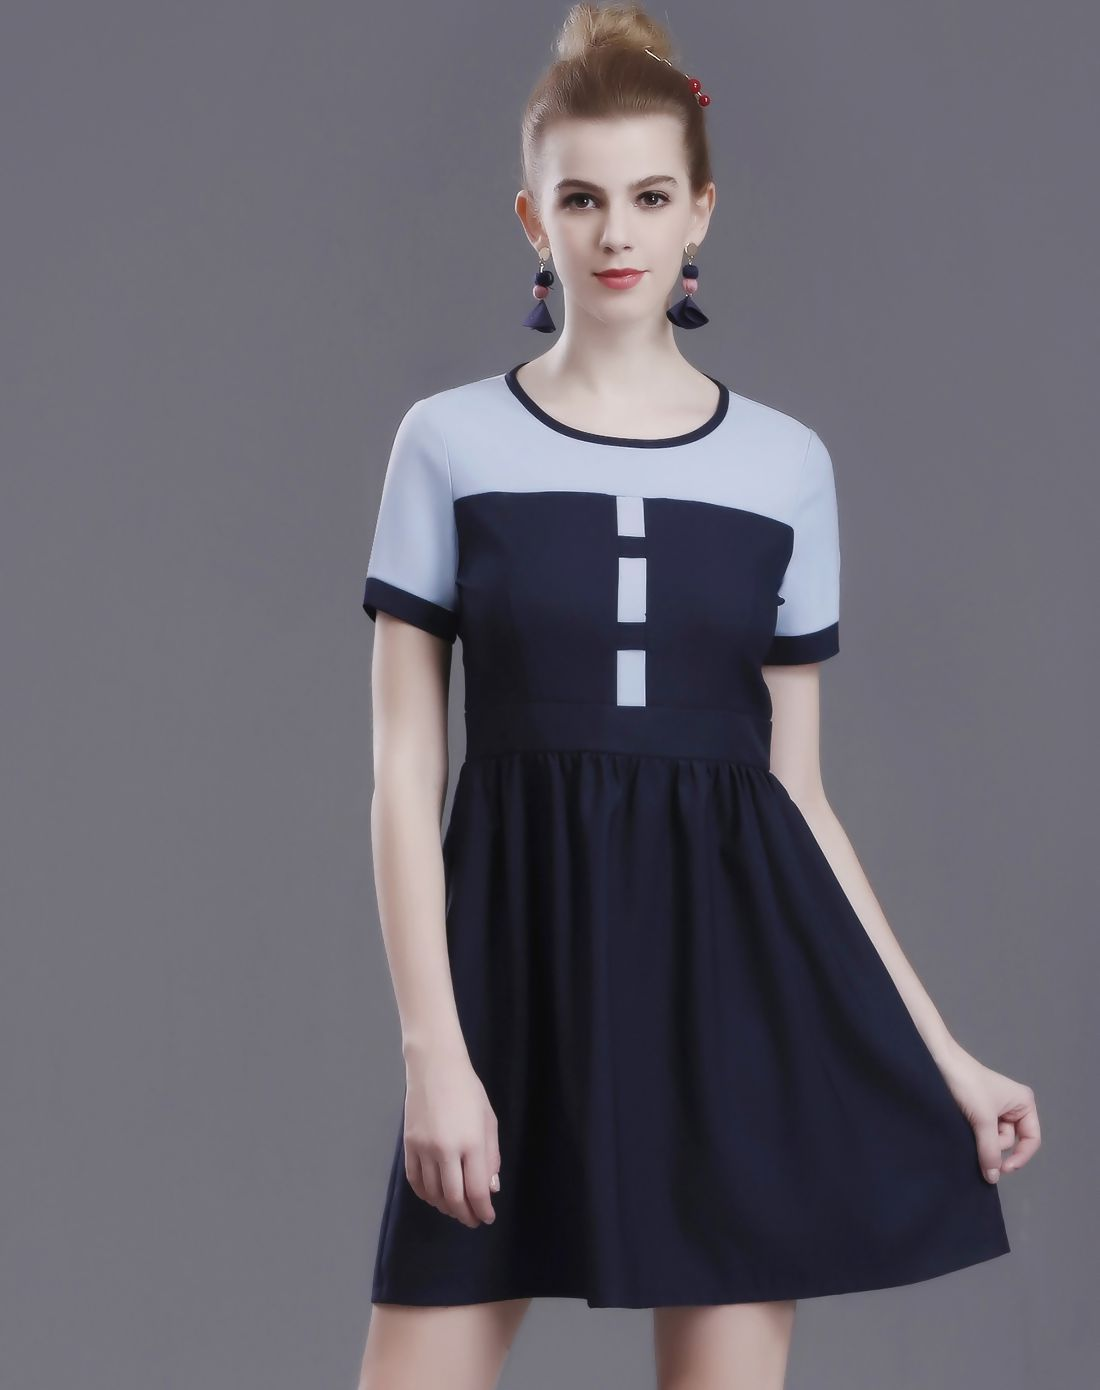 Adorewe vipme aline dressesdesigner qinyanzui blue colorblock